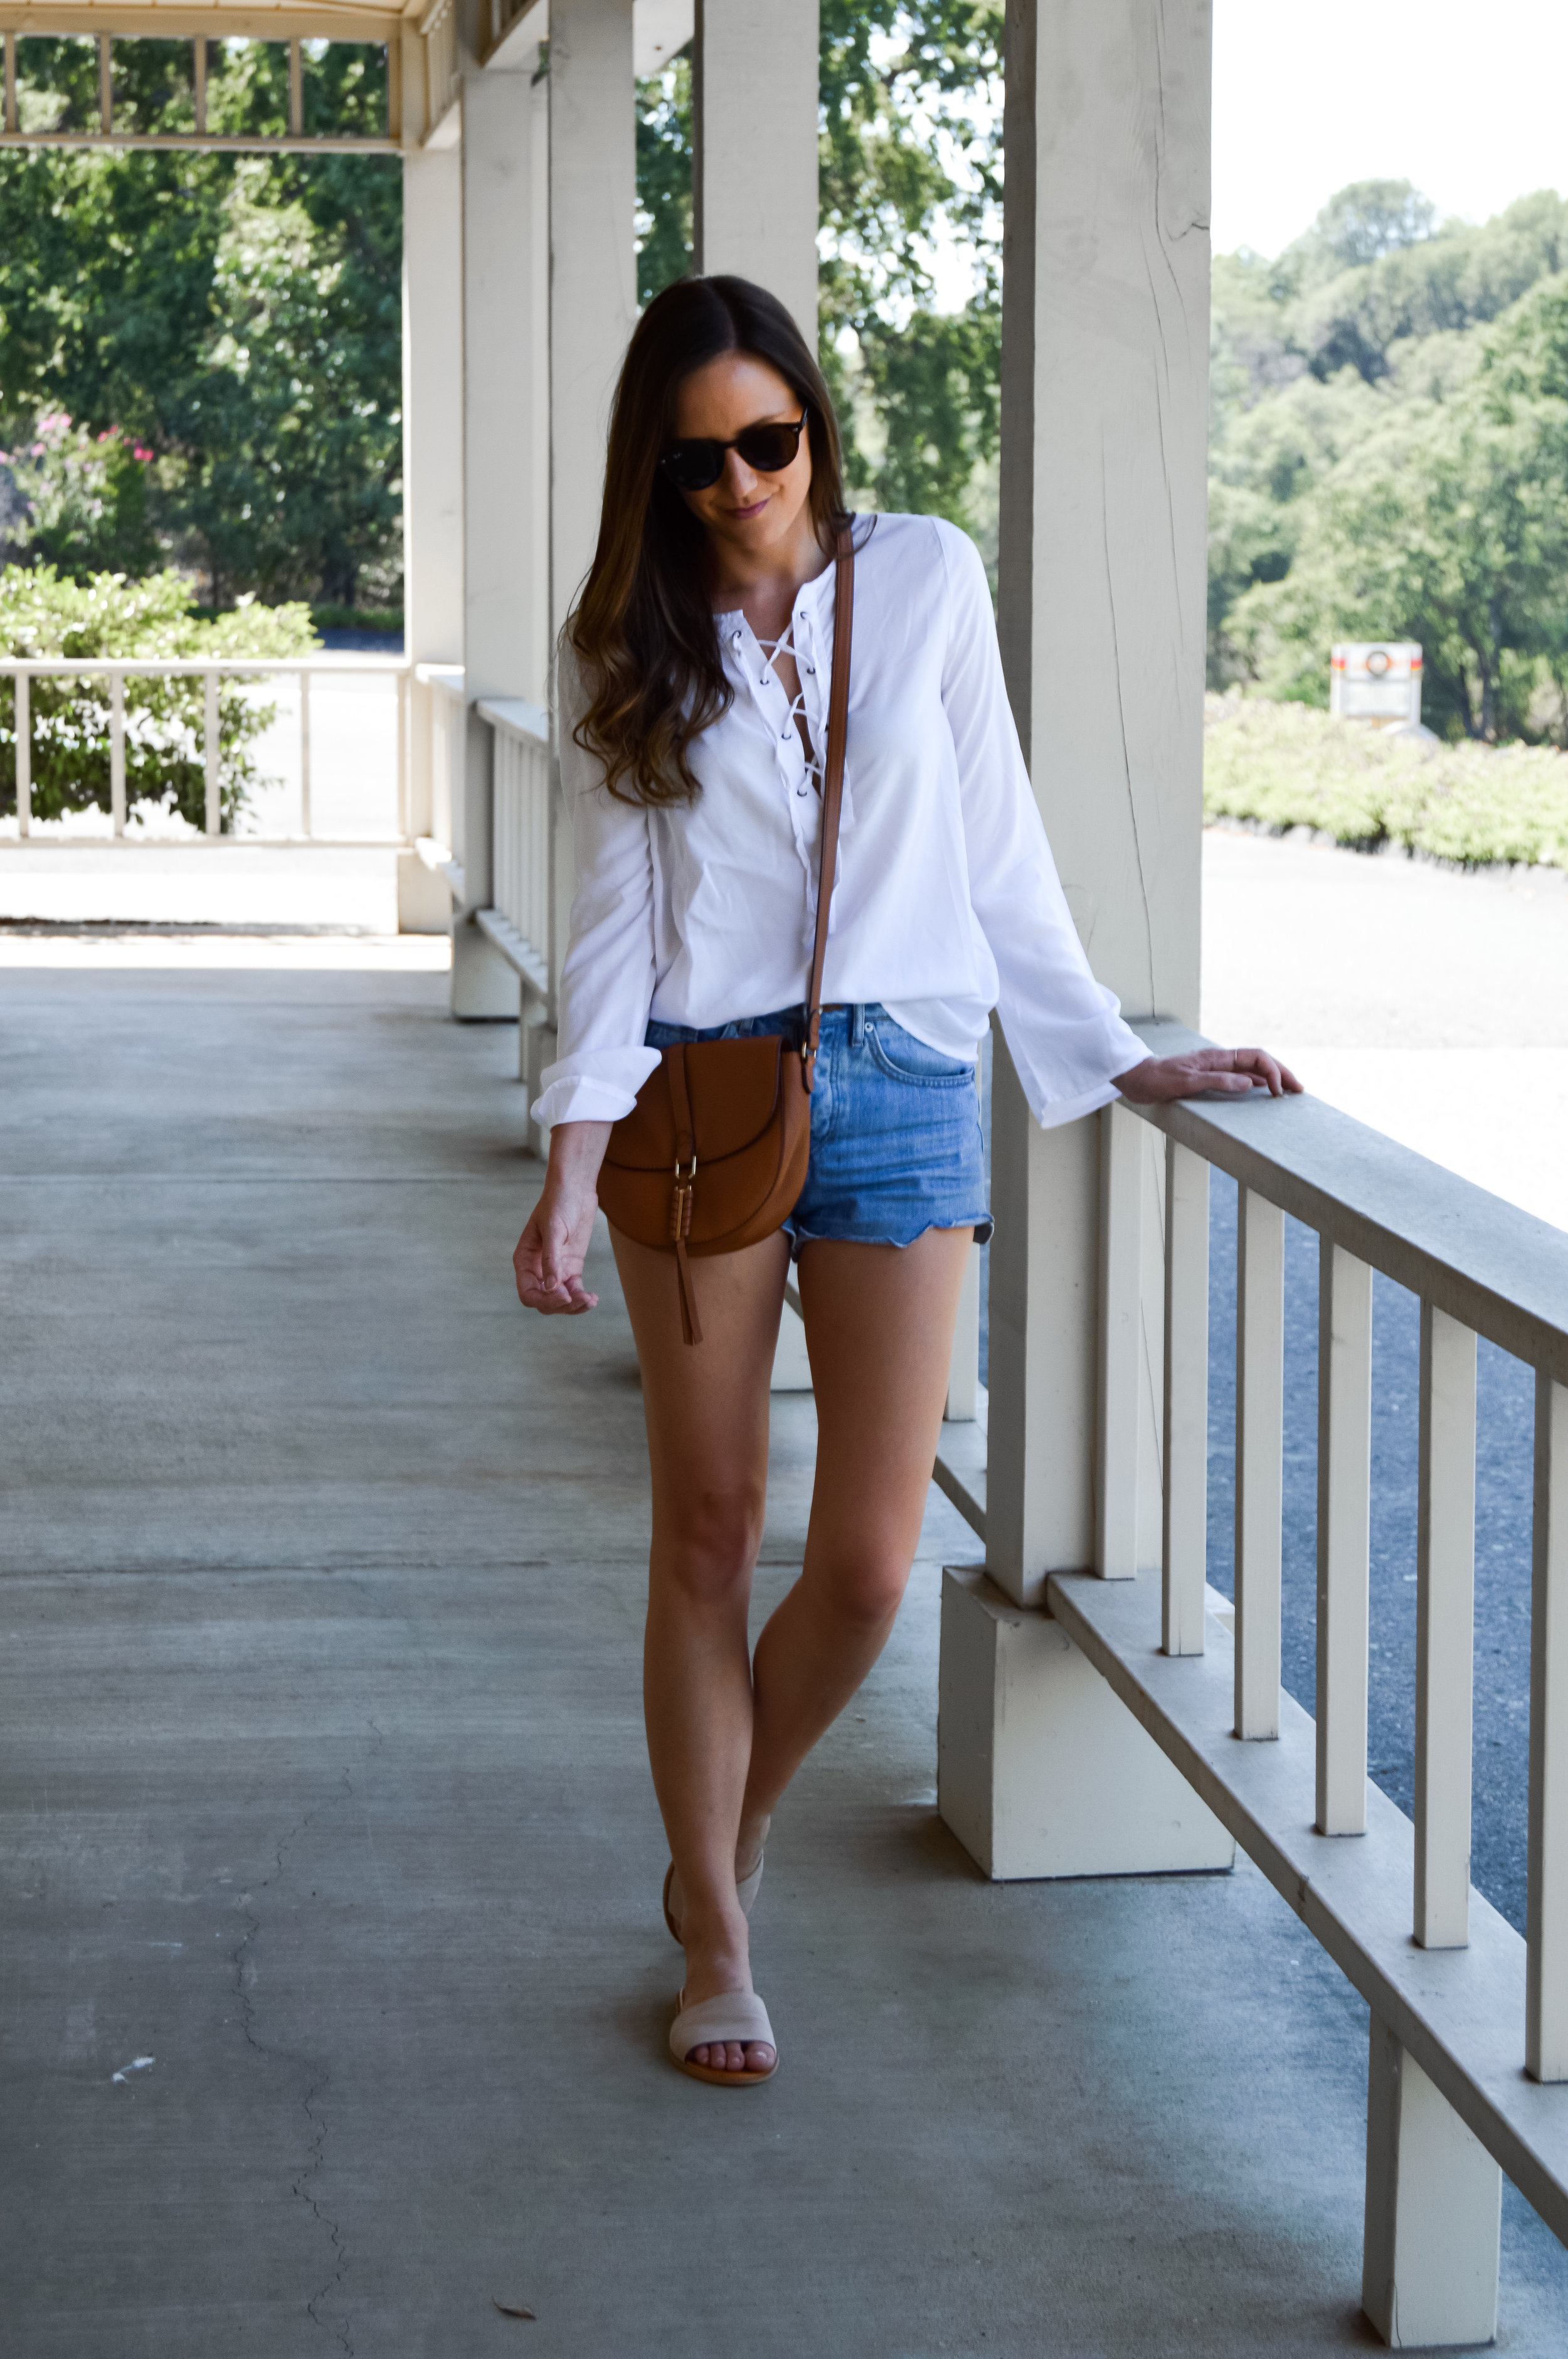 Shop the Look Below.  T.J. Maxx Top  |  H&M Shorts |  Nordstrom Sandals  |  Stella & Dot Bag  c/o |  Ray-Ban Sunglasses